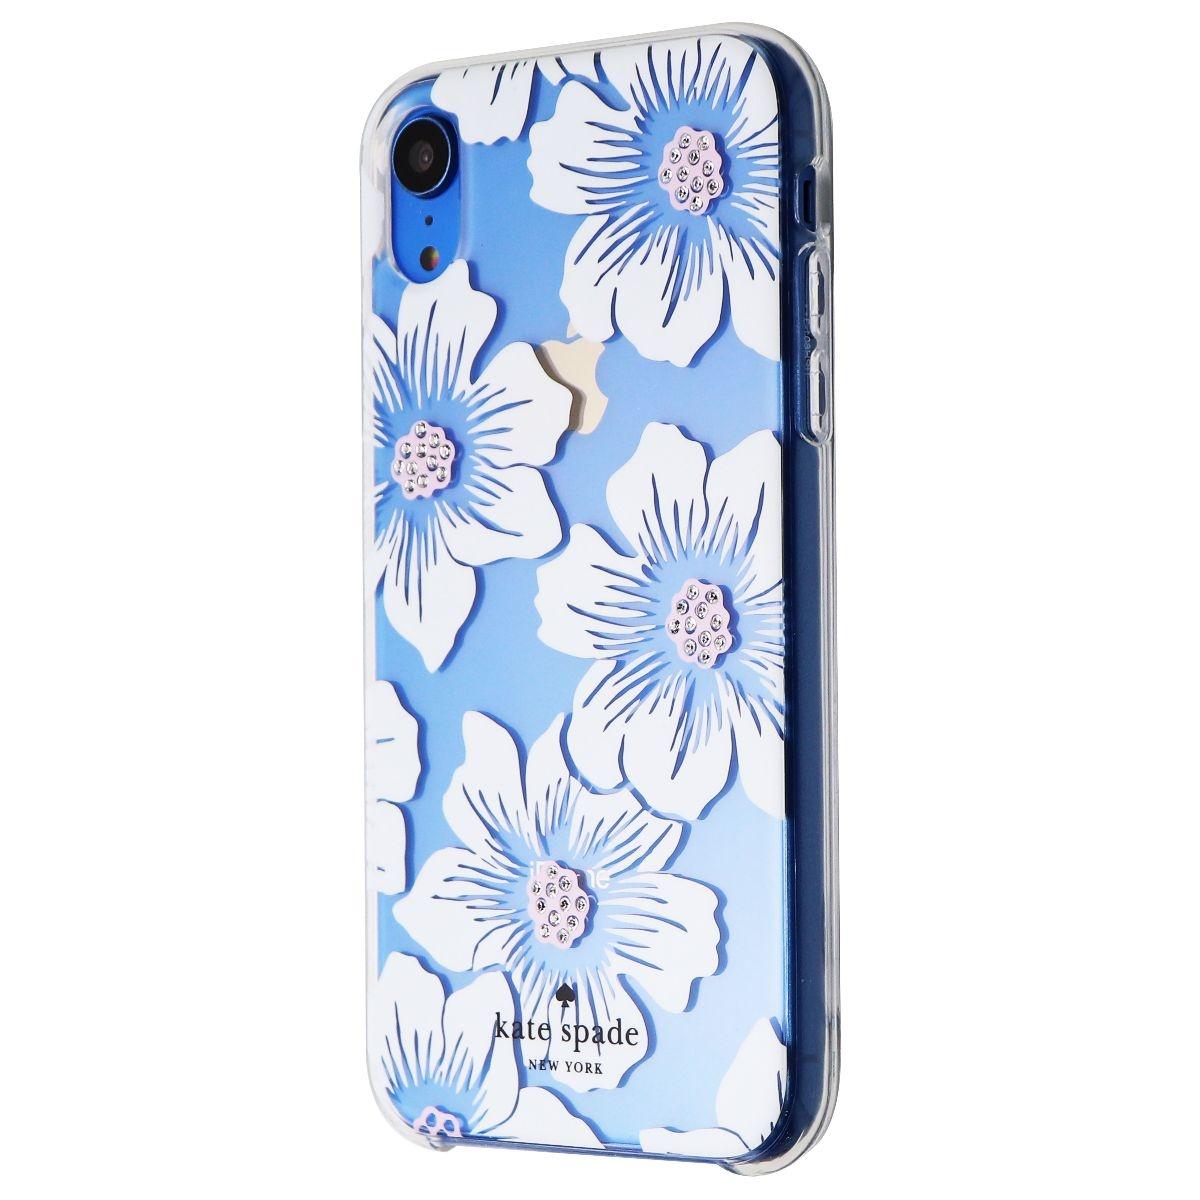 Kate Spade New York Slim Case for Apple iPhone XR - Hollyhock Cream/Blush/Gem